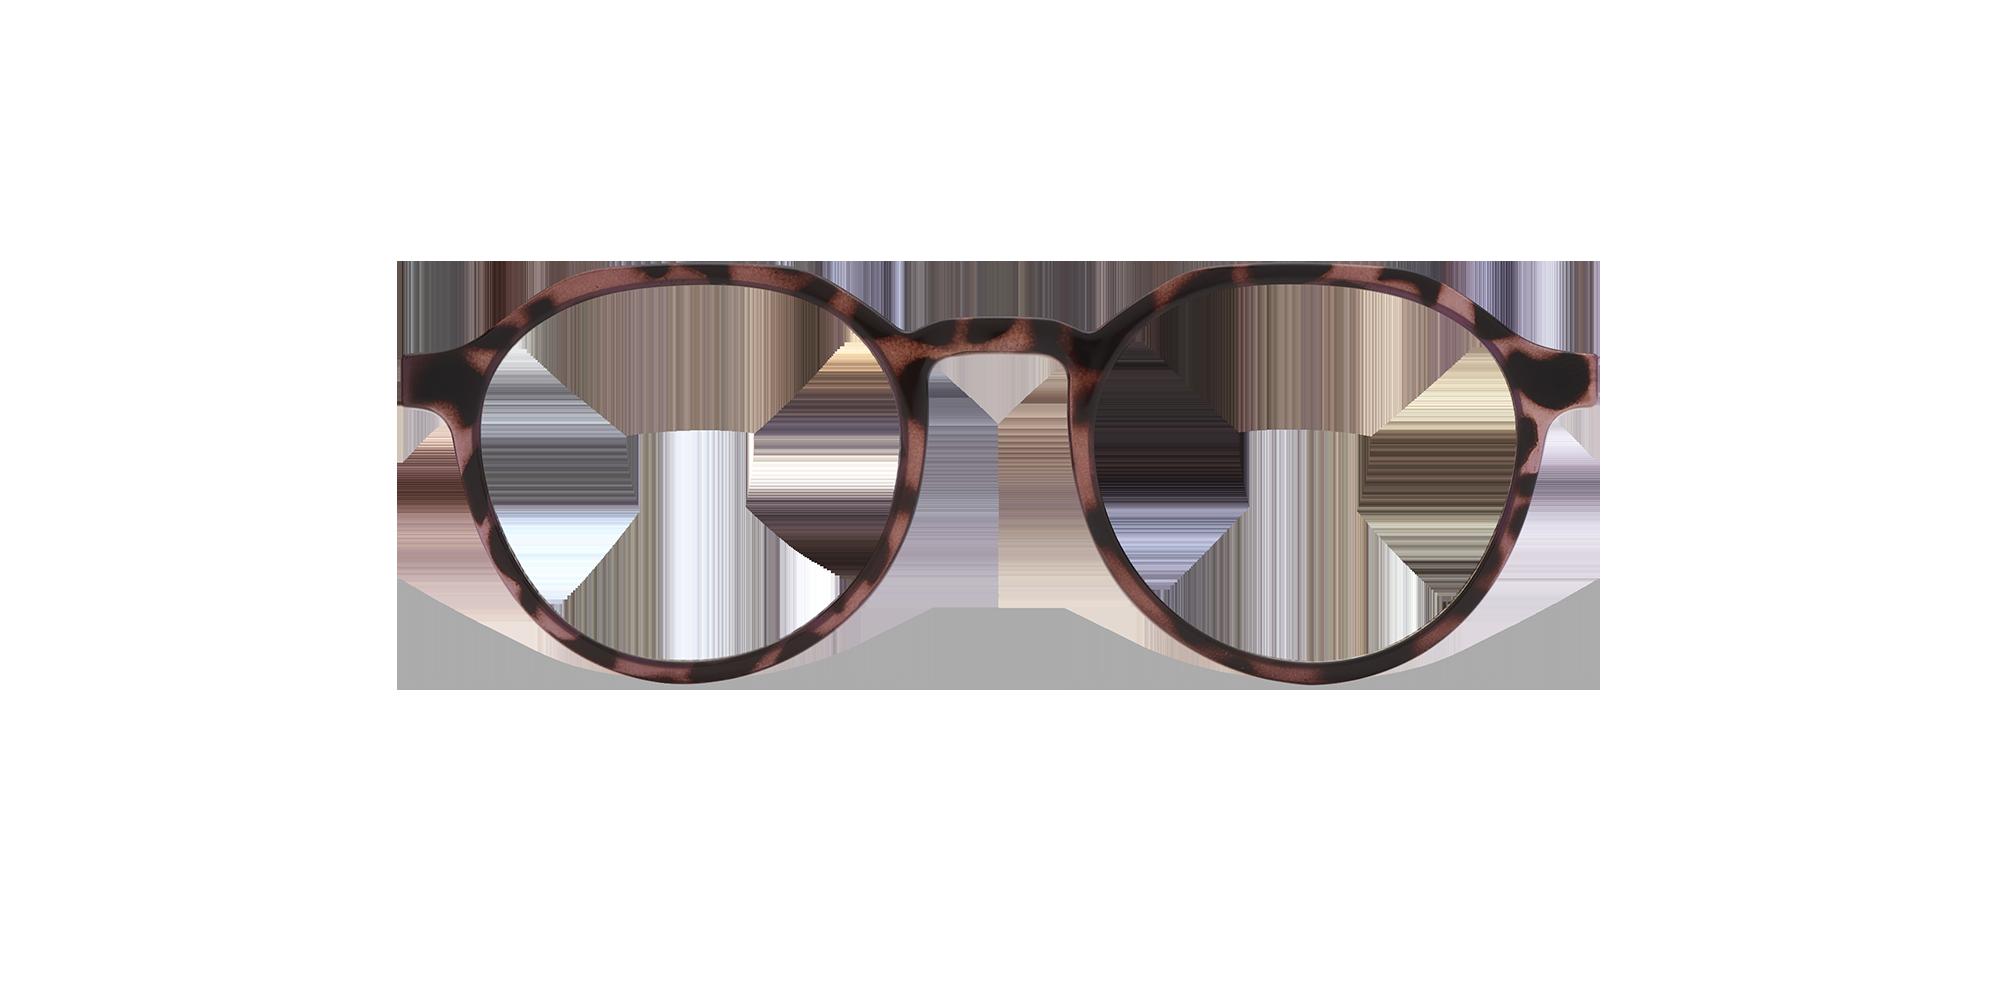 afflelou/france/products/smart_clip/clips_glasses/07630036429013_face.png